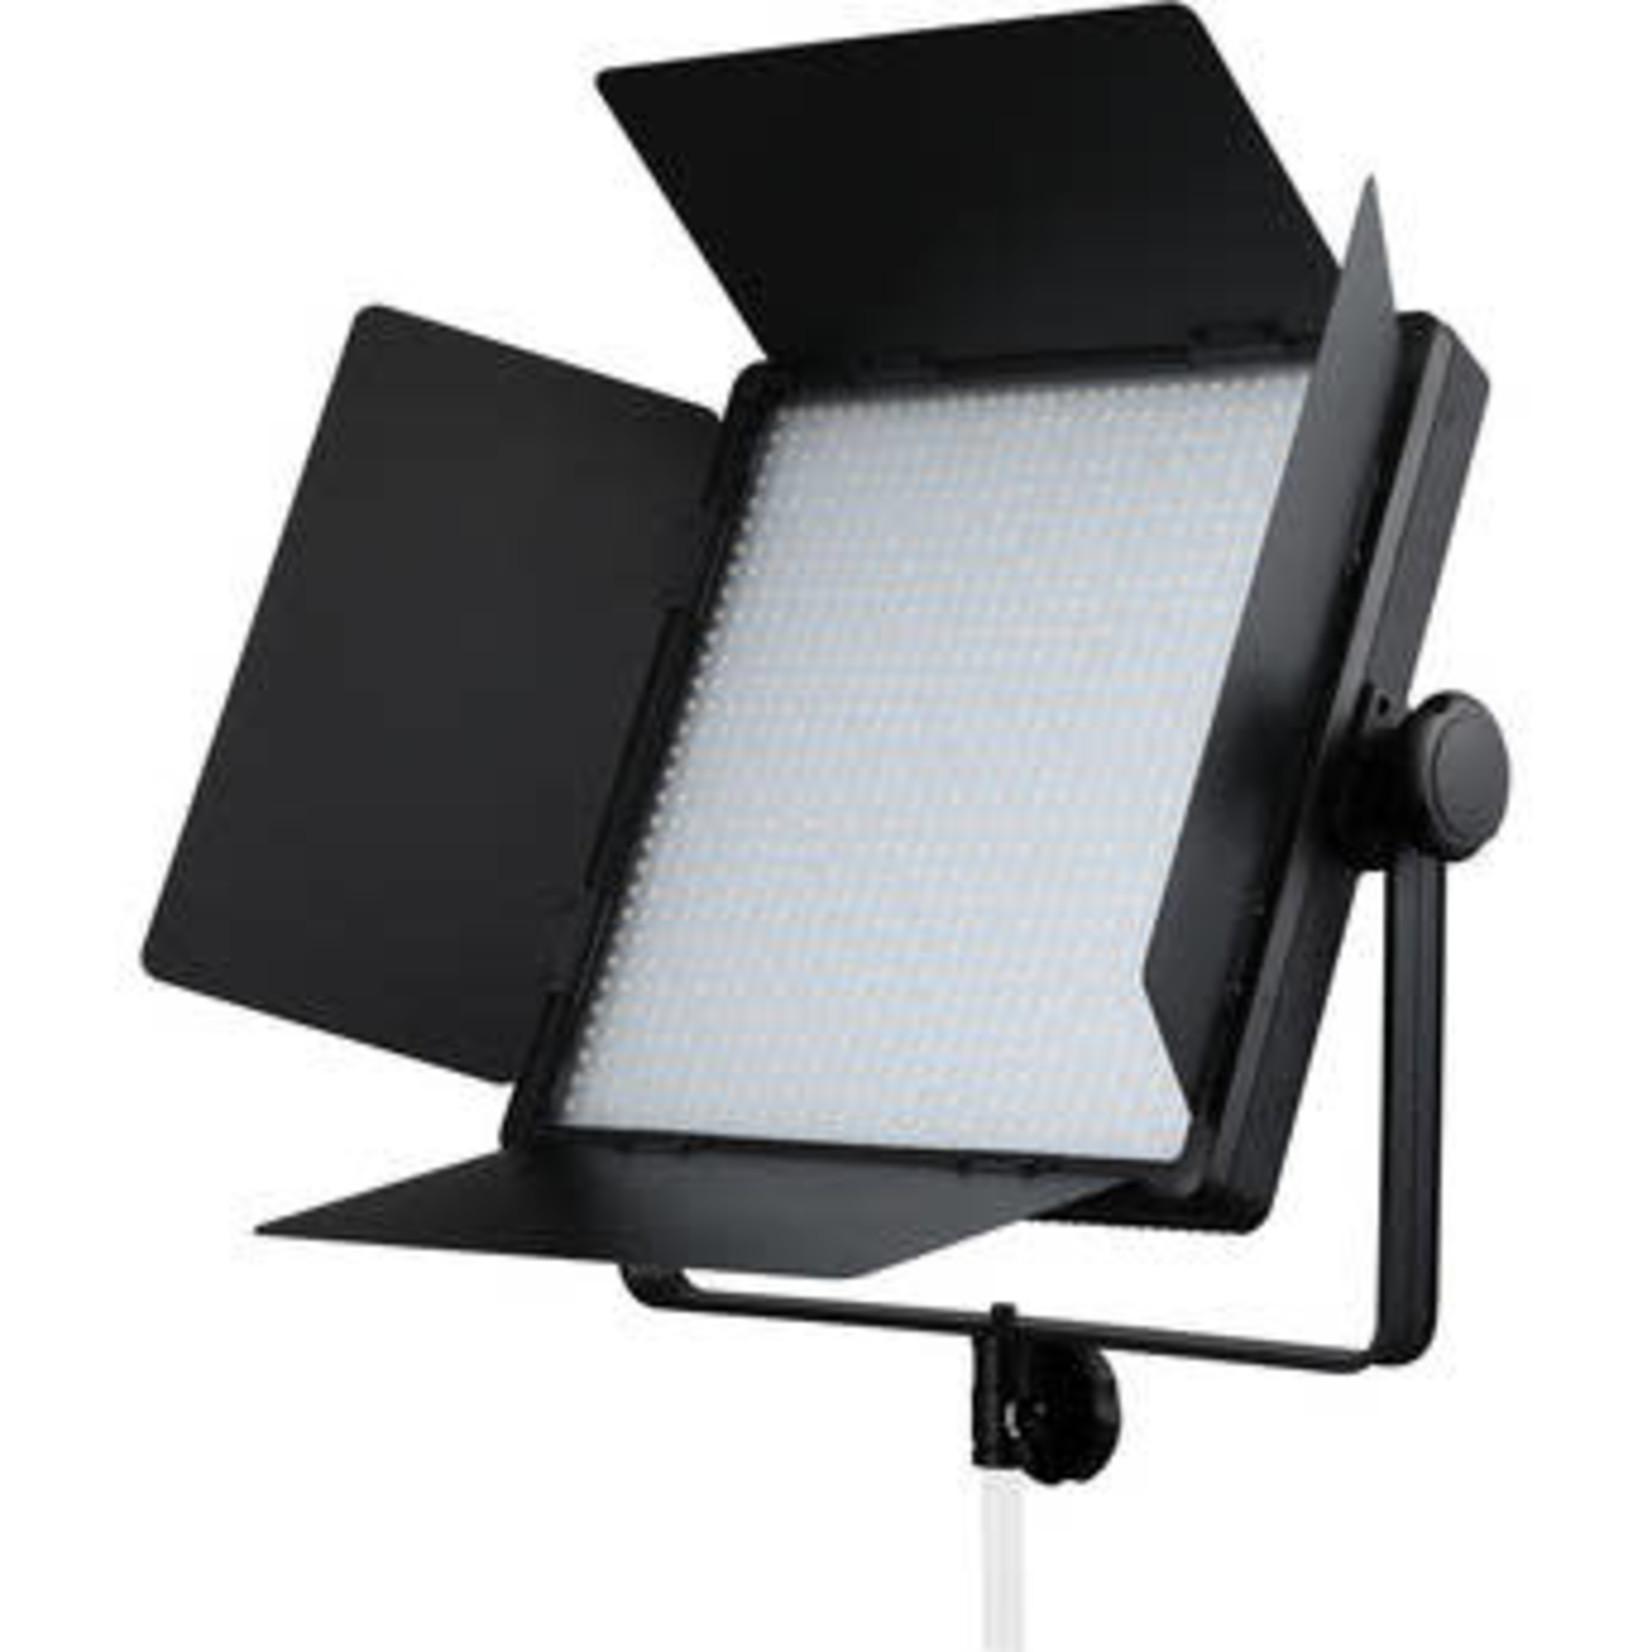 Godox Godox LED 1000D II Daylight Video Light